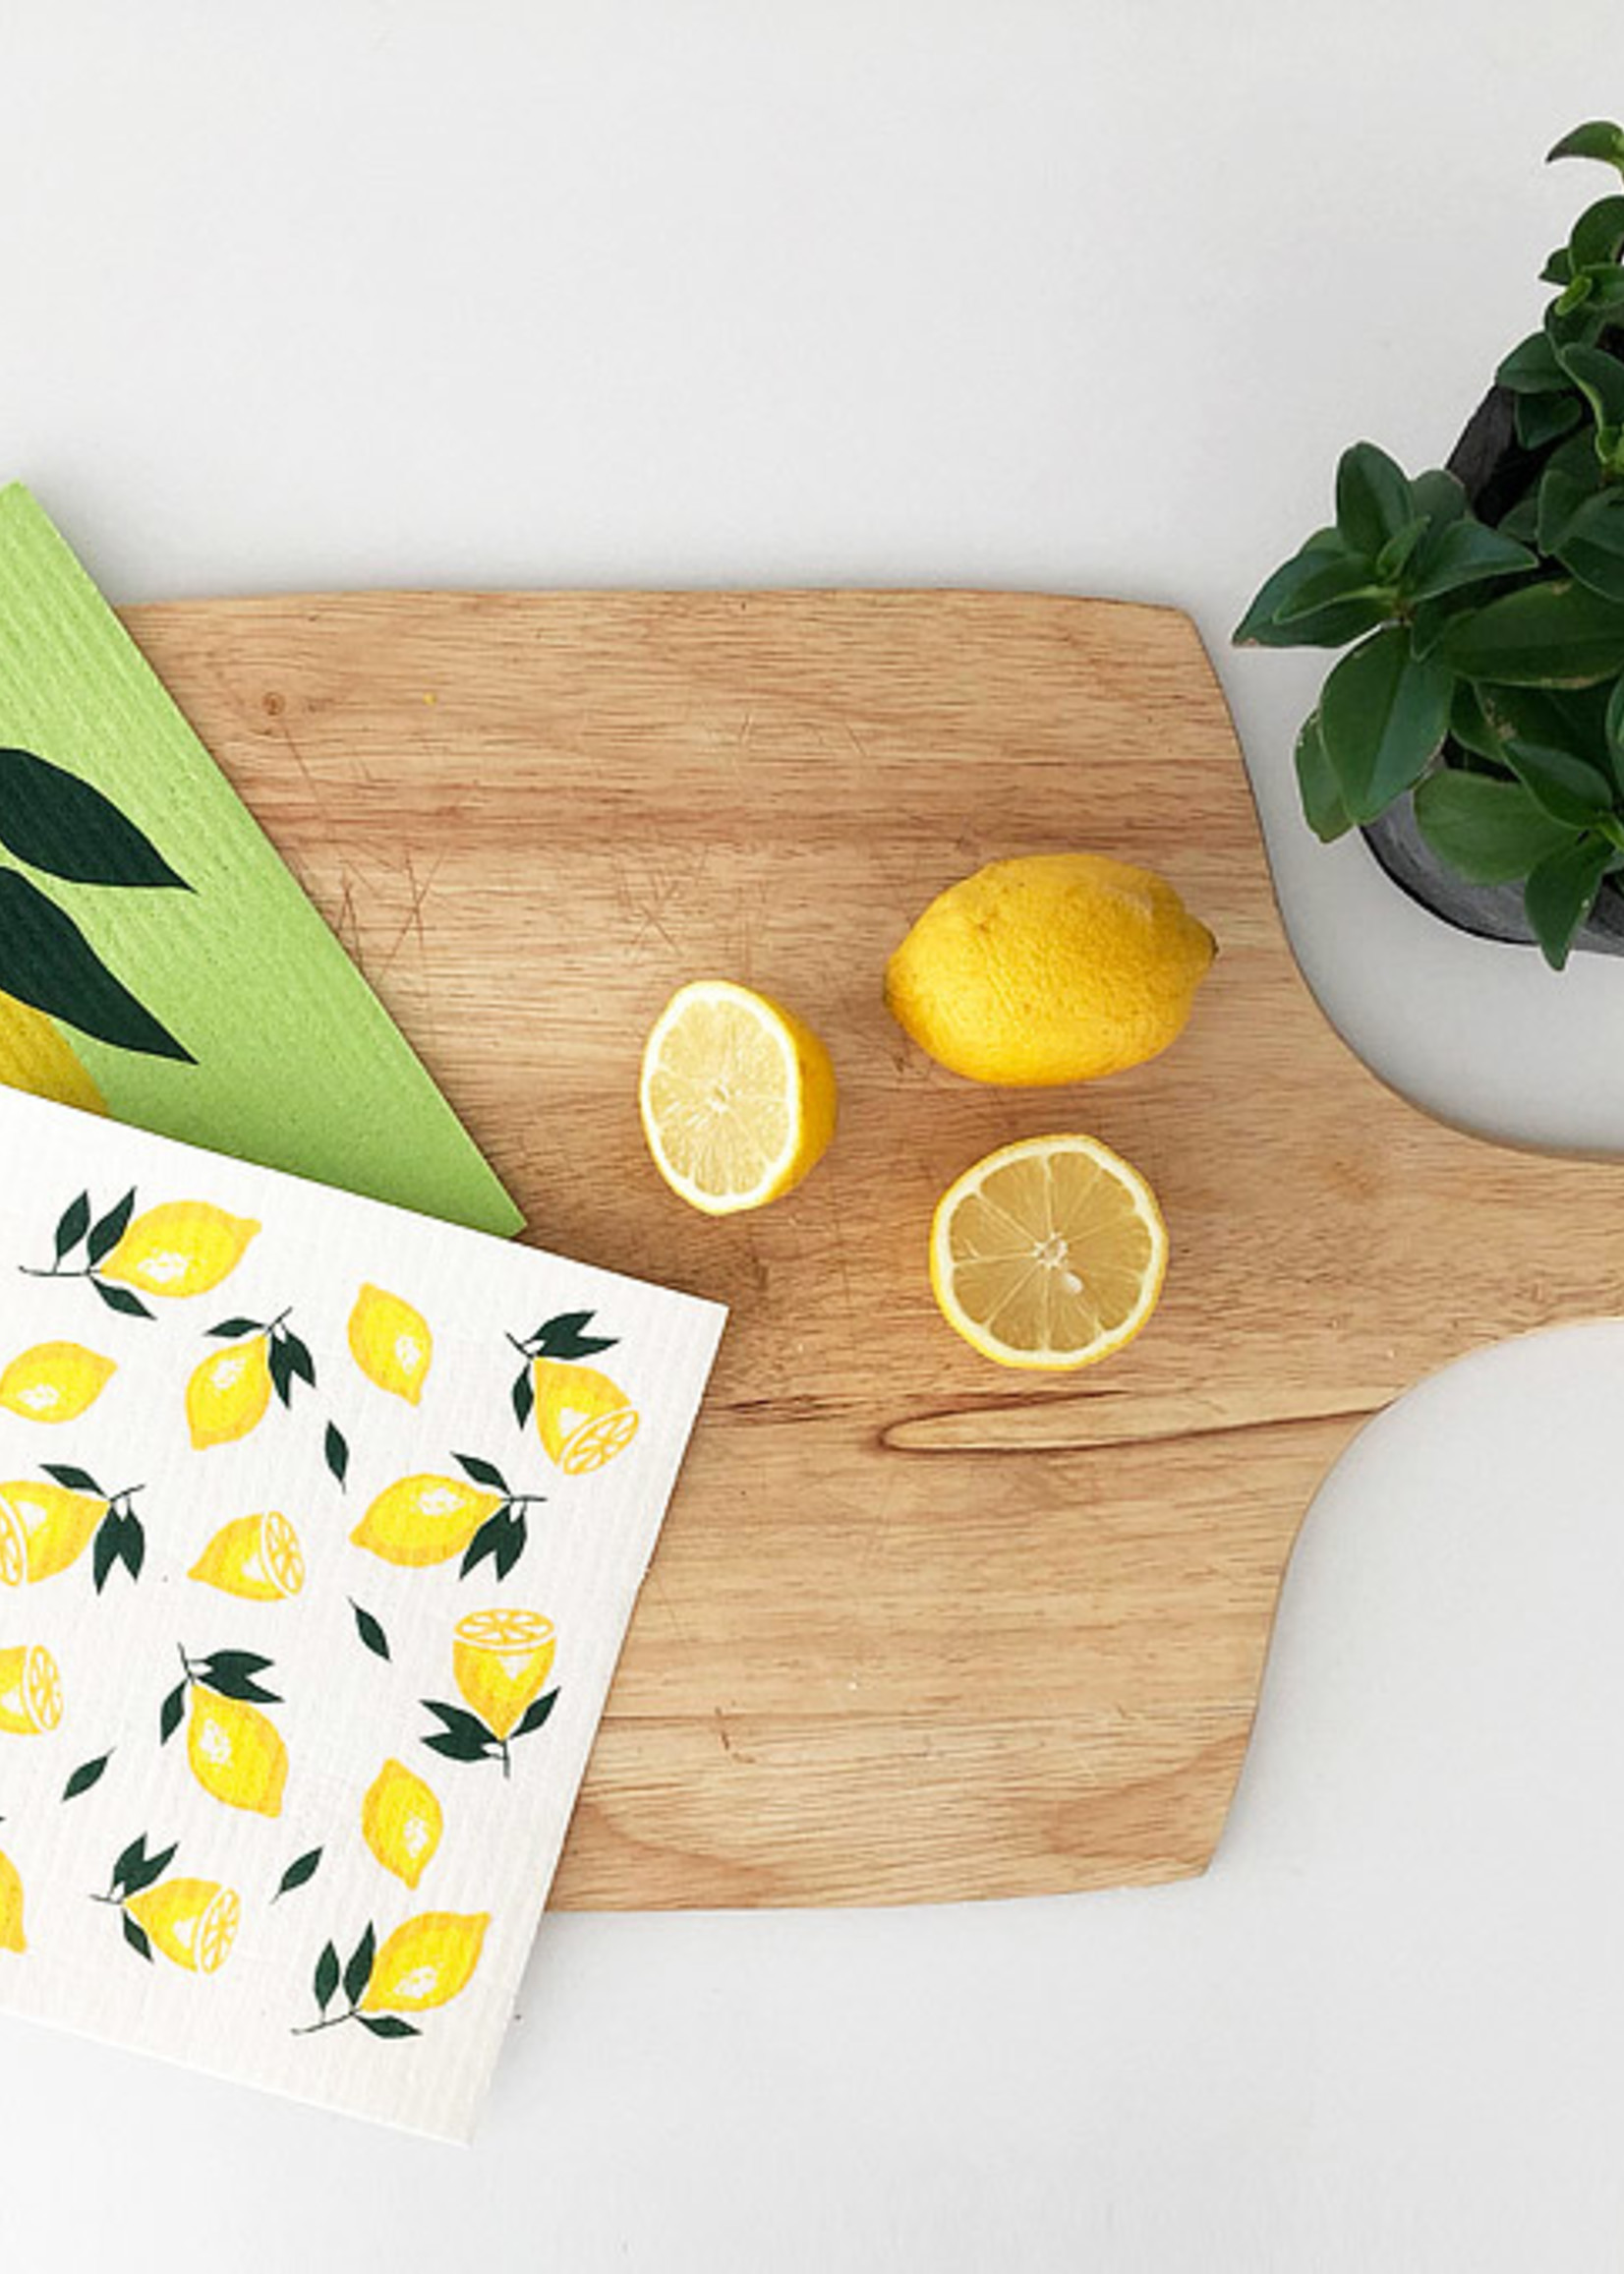 Abbott S/2 Lemon Swedish Dishcloths